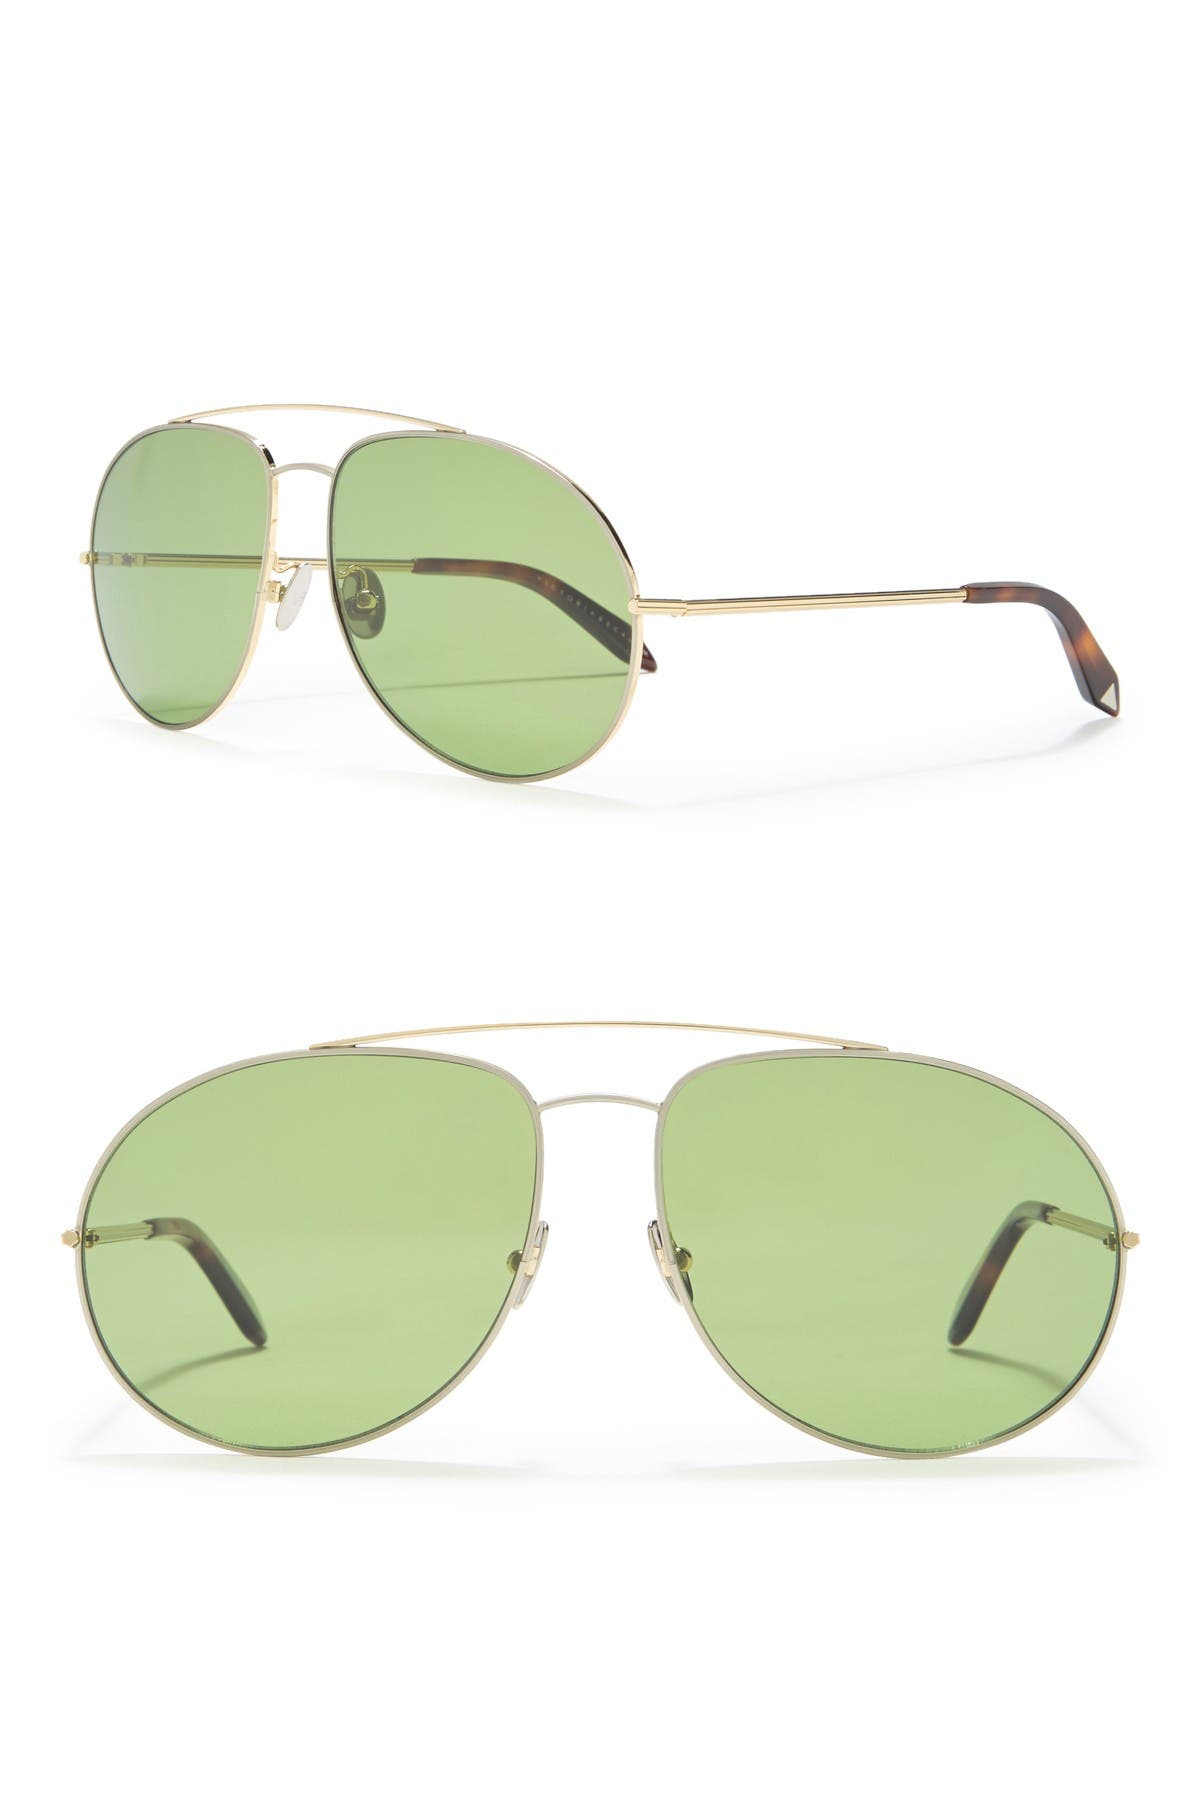 Image of Victoria Beckham 62mm Aviator Sunglasses